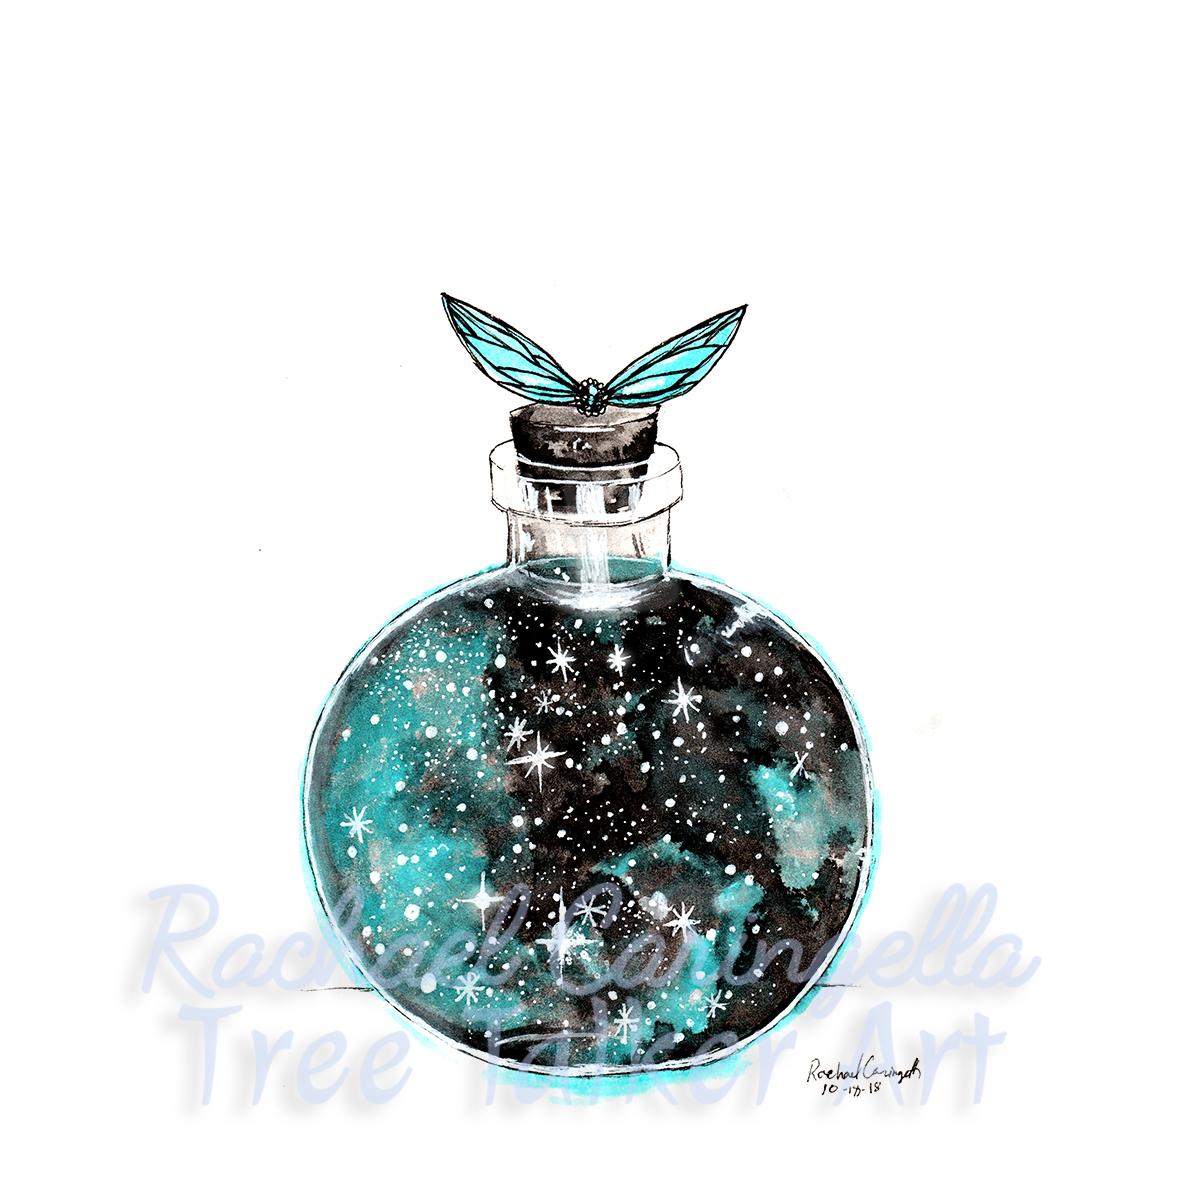 Tree Talker Art Inktober 2018 Illustration of a bottle of fairy dust